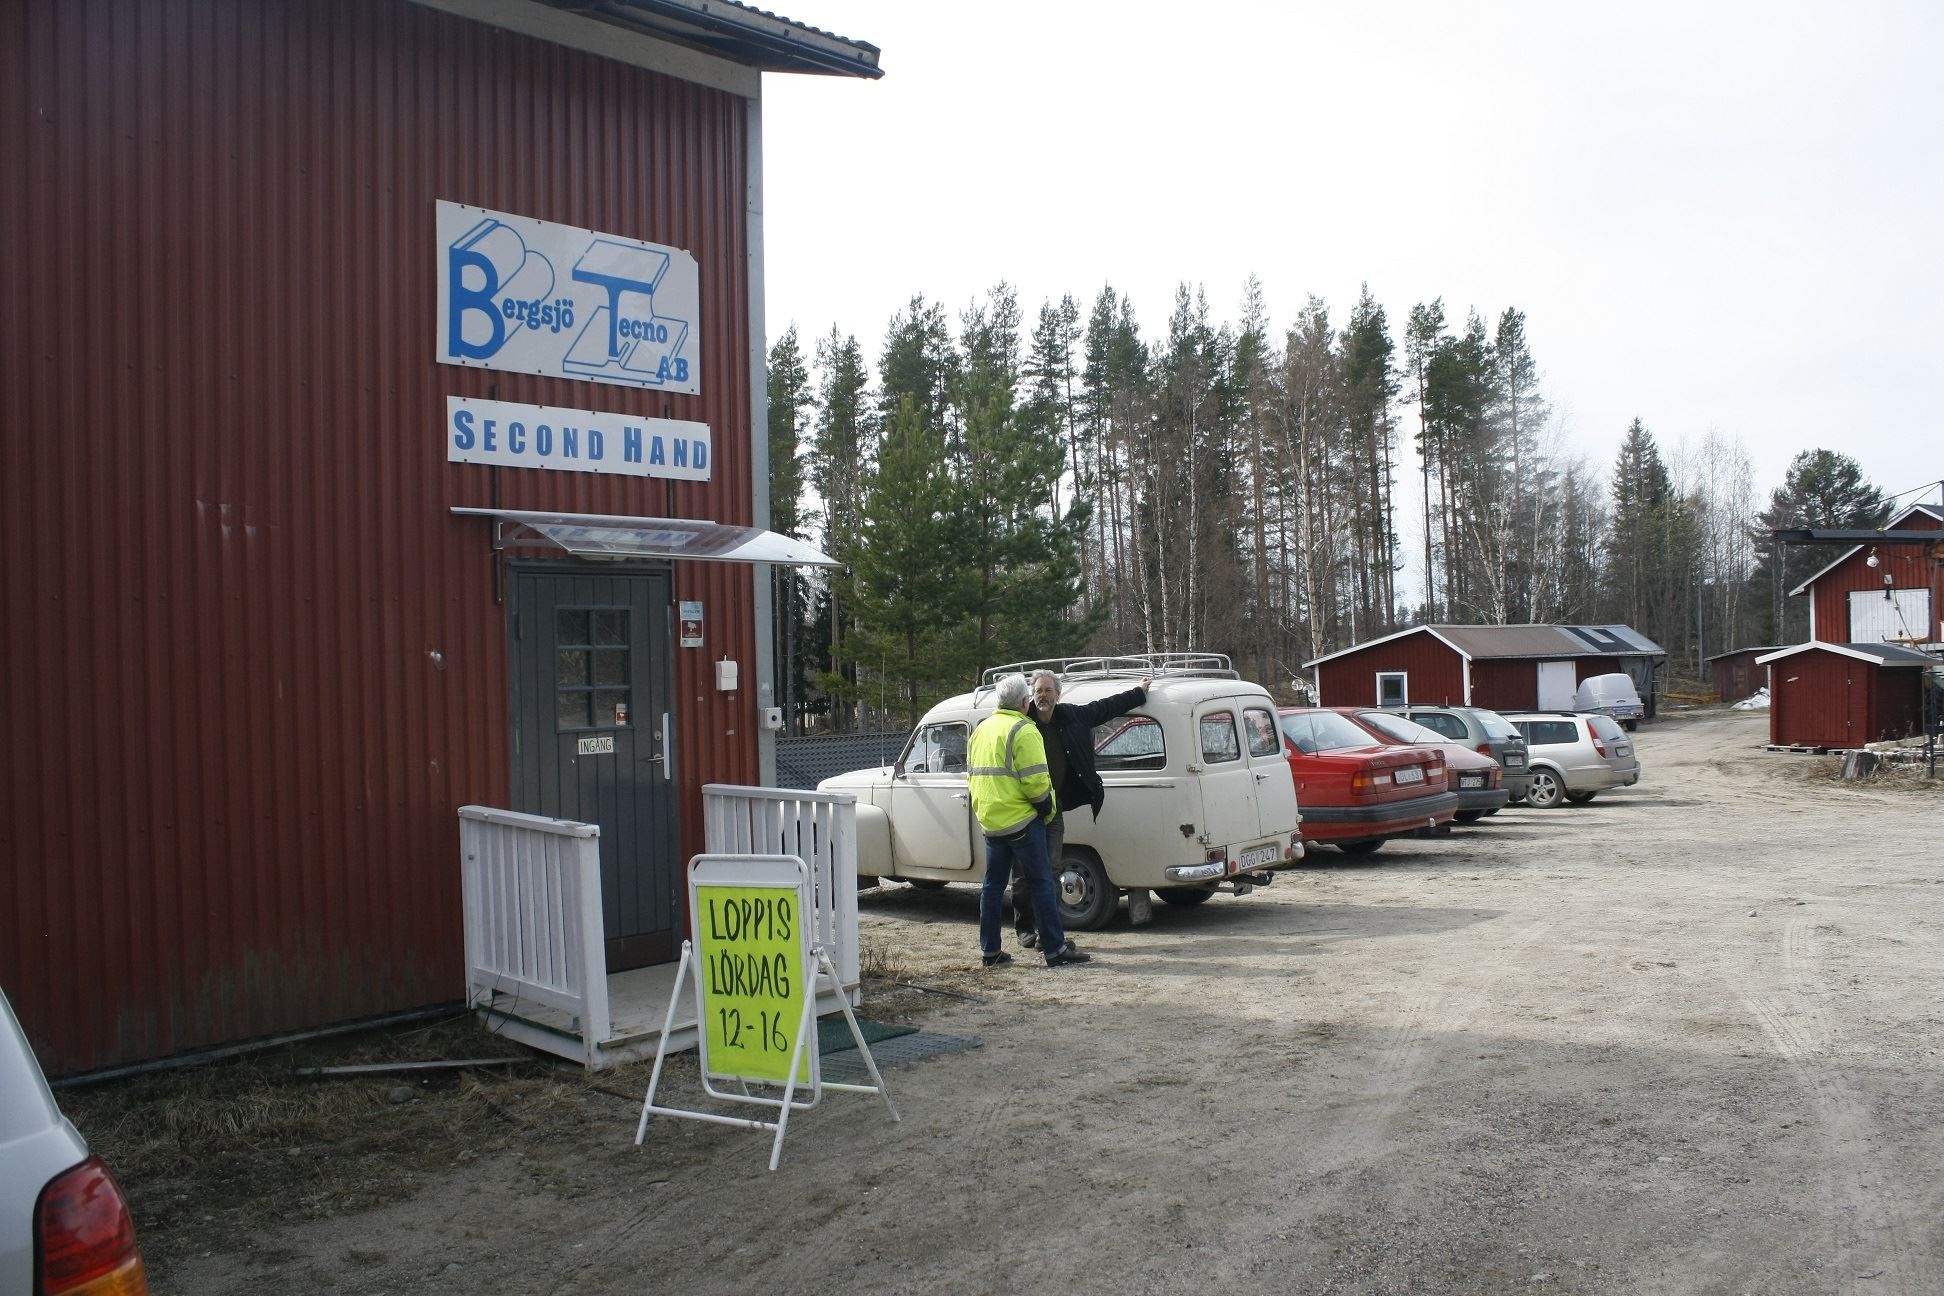 Bergsjö Tecno - Second Hand & Loppis